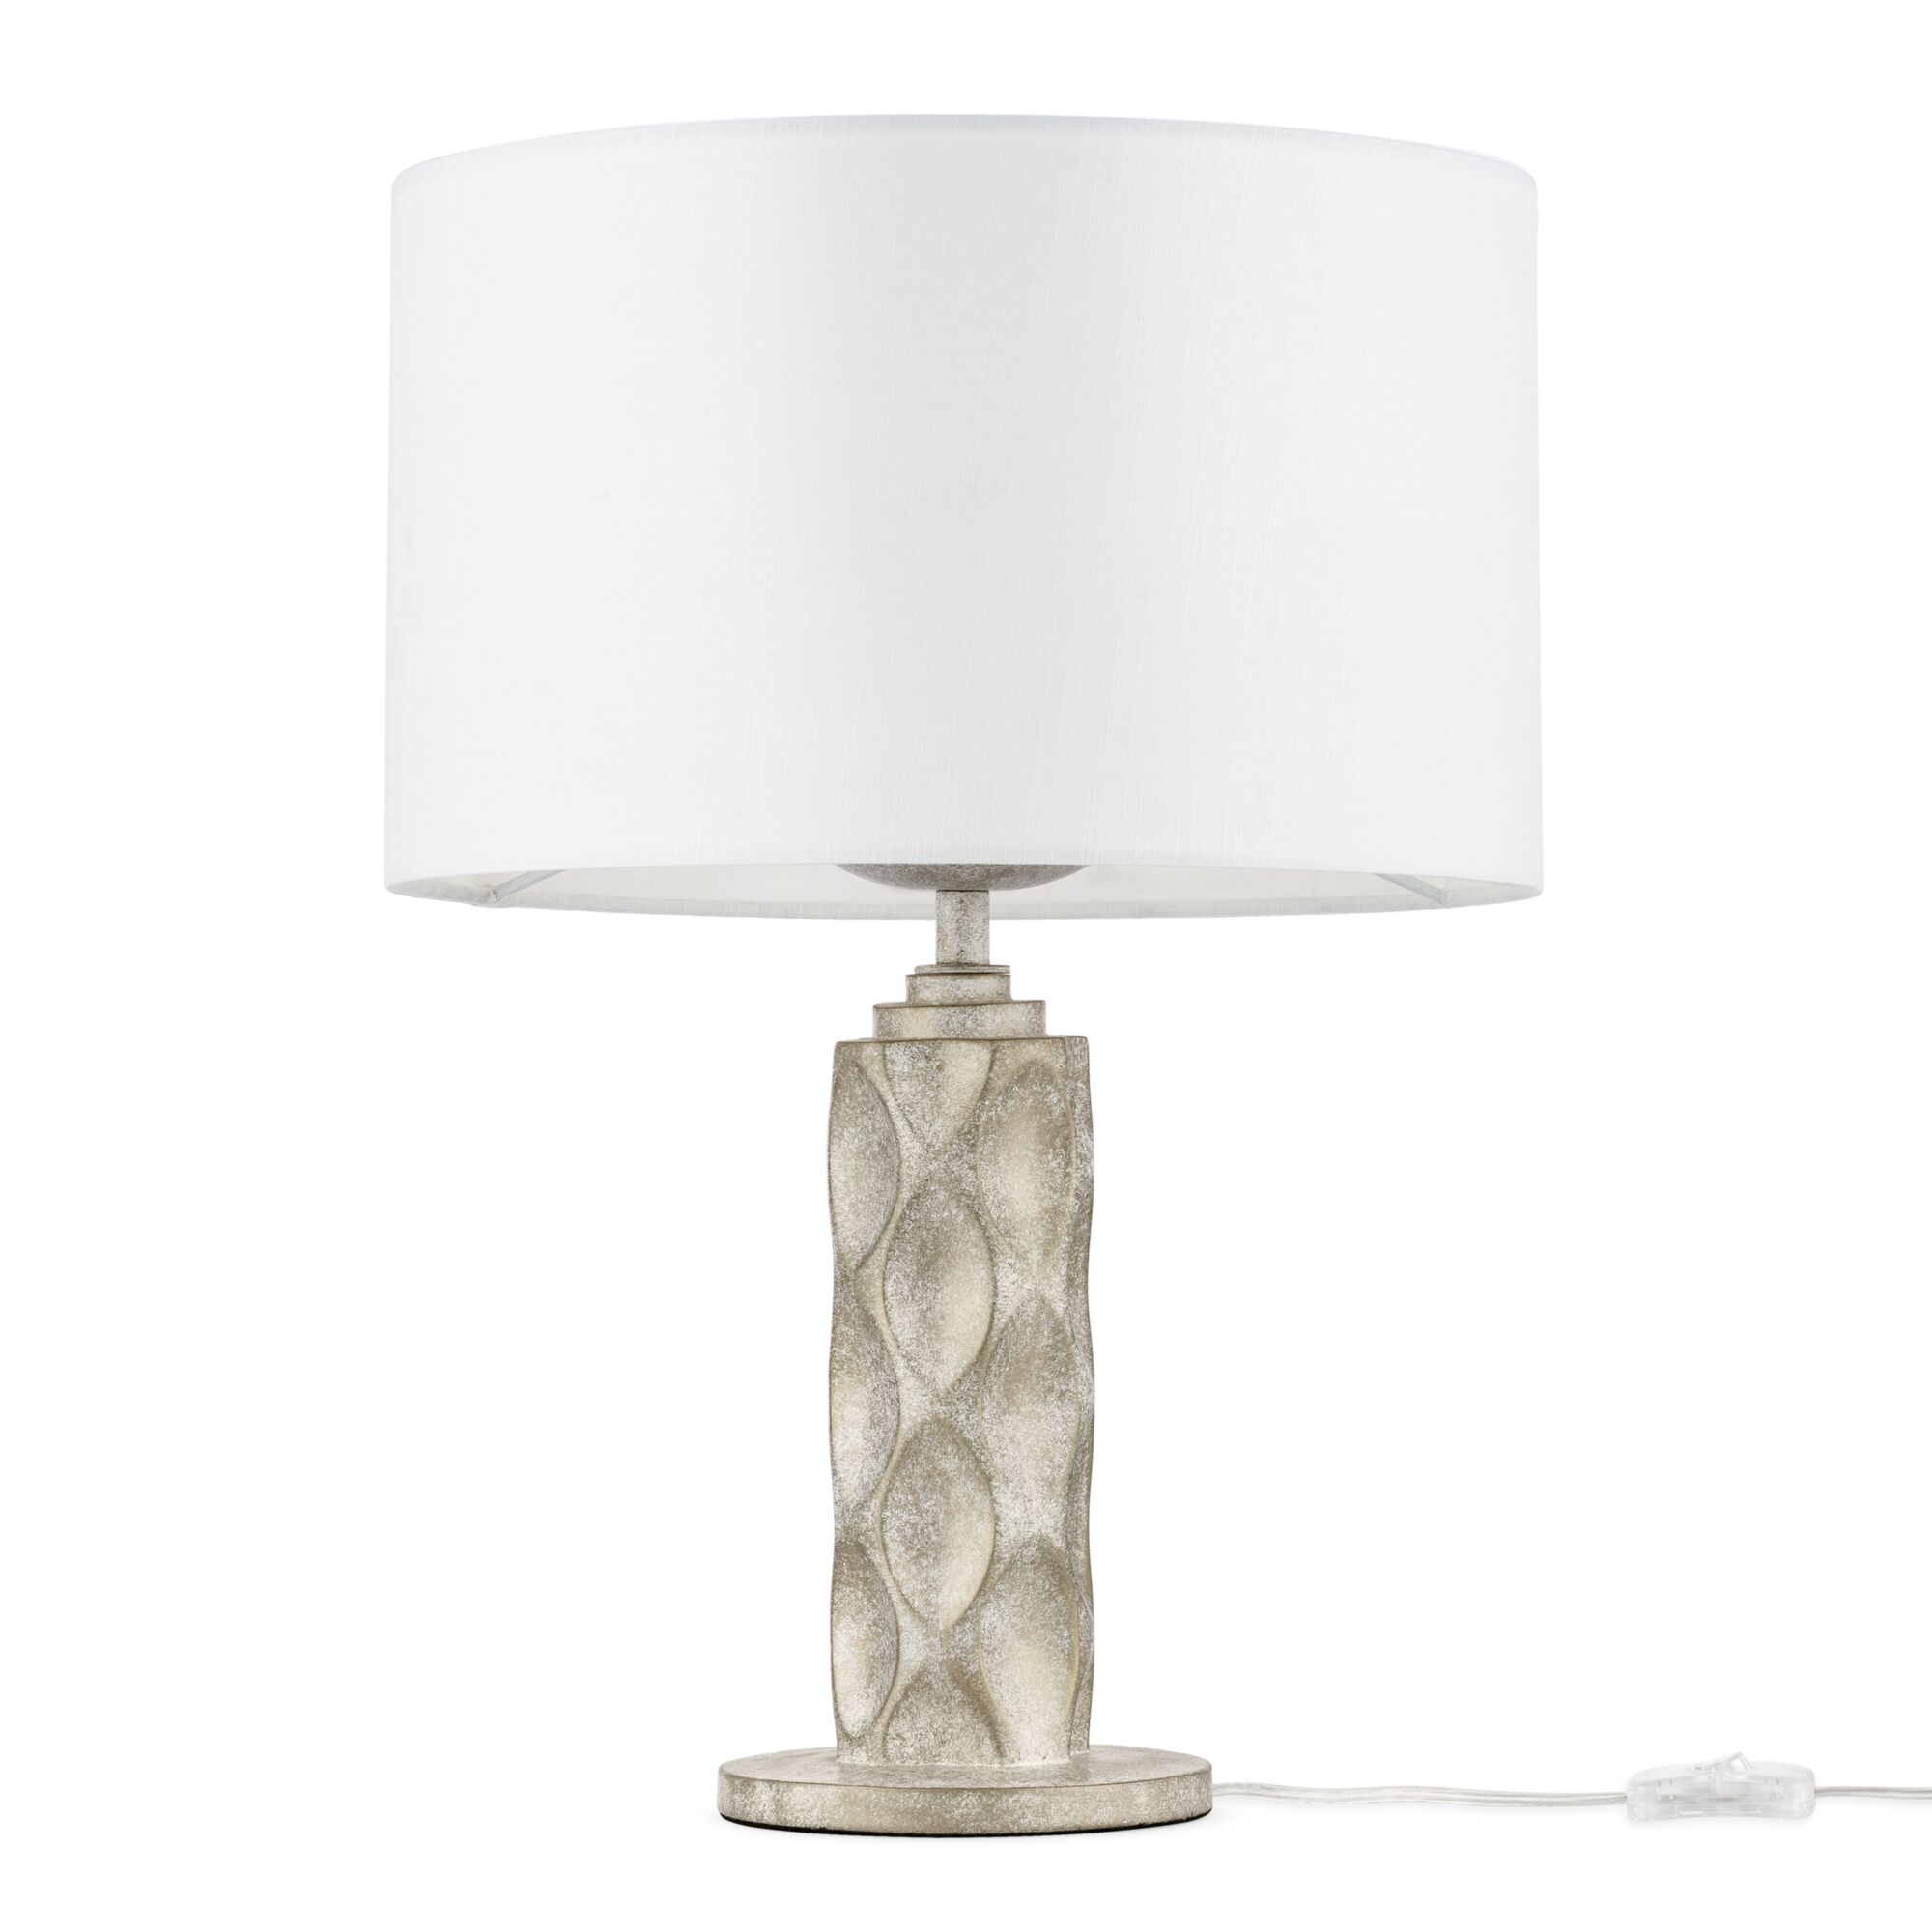 Настольная лампа Maytoni H301-11-G Кремовый с Золотом 1хE27х60W